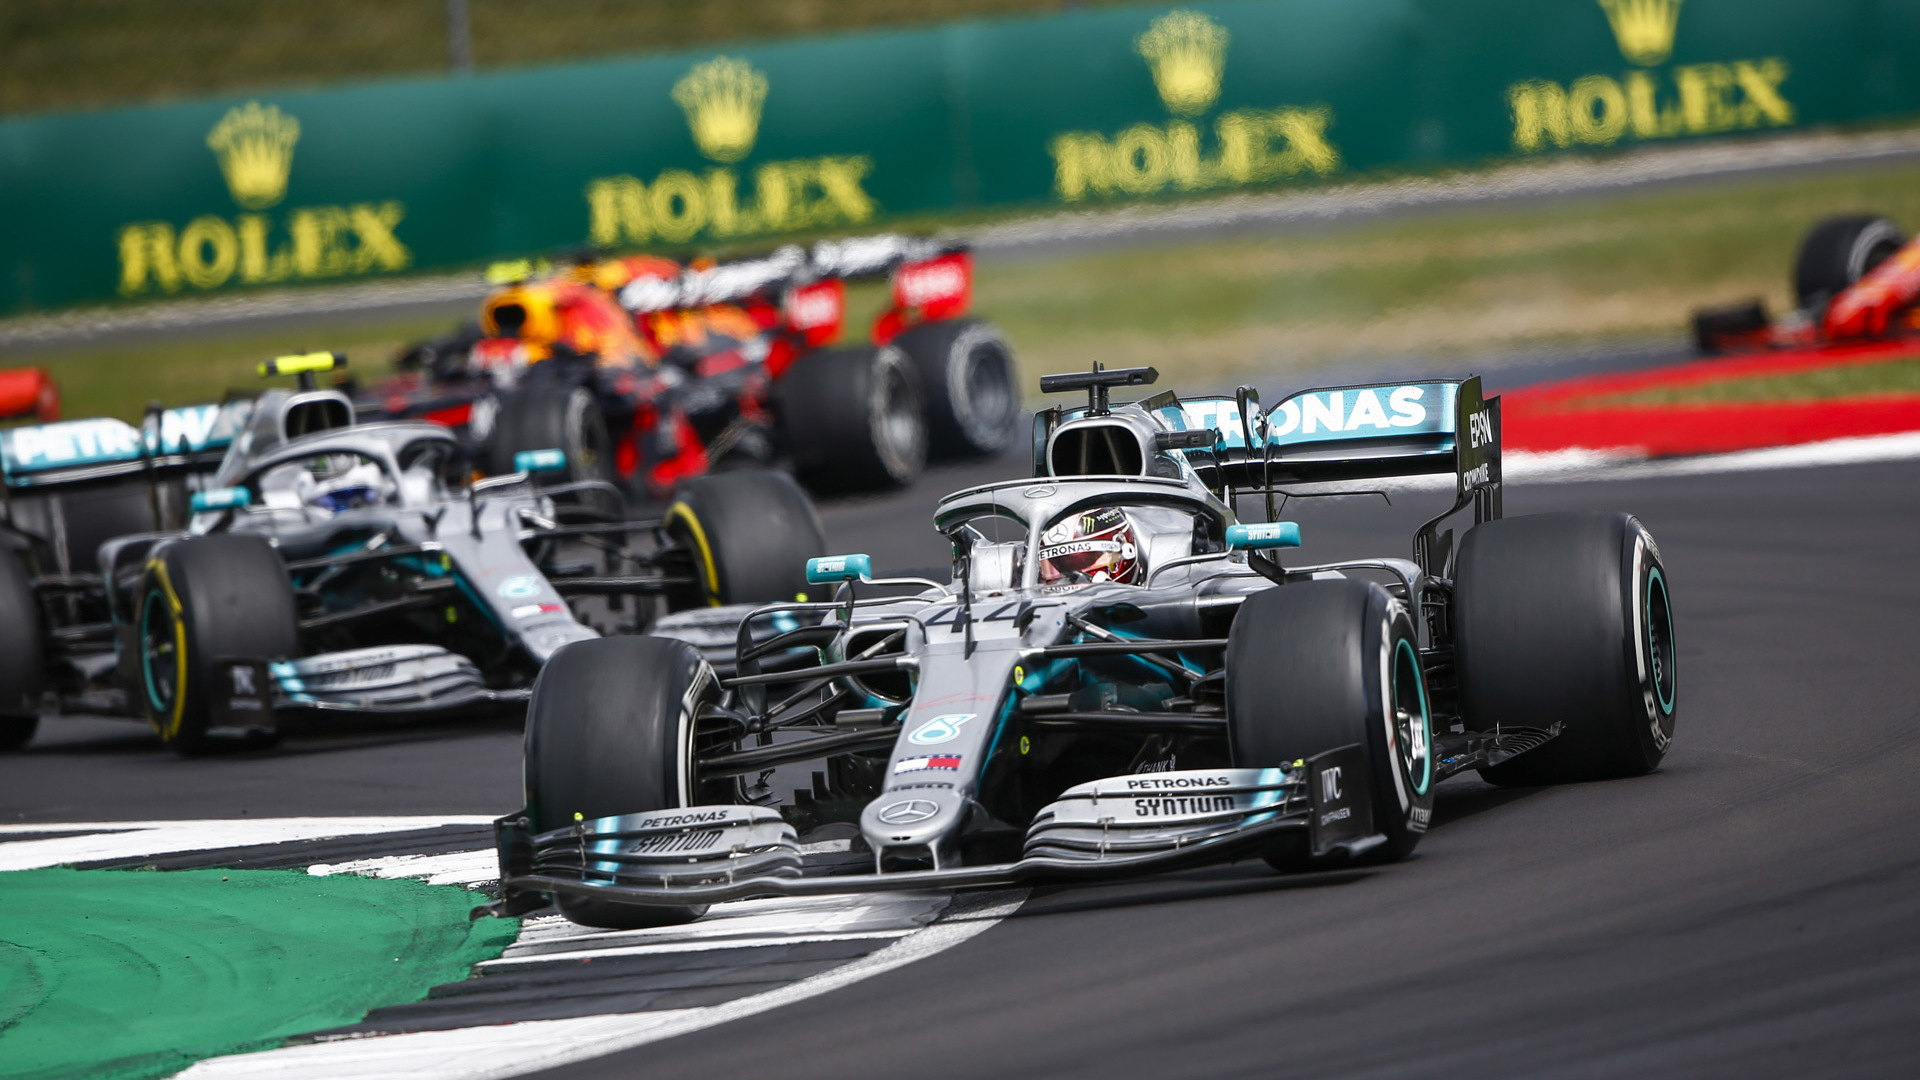 Mercedes-AMG at the 2019 Formula One British Grand Prix